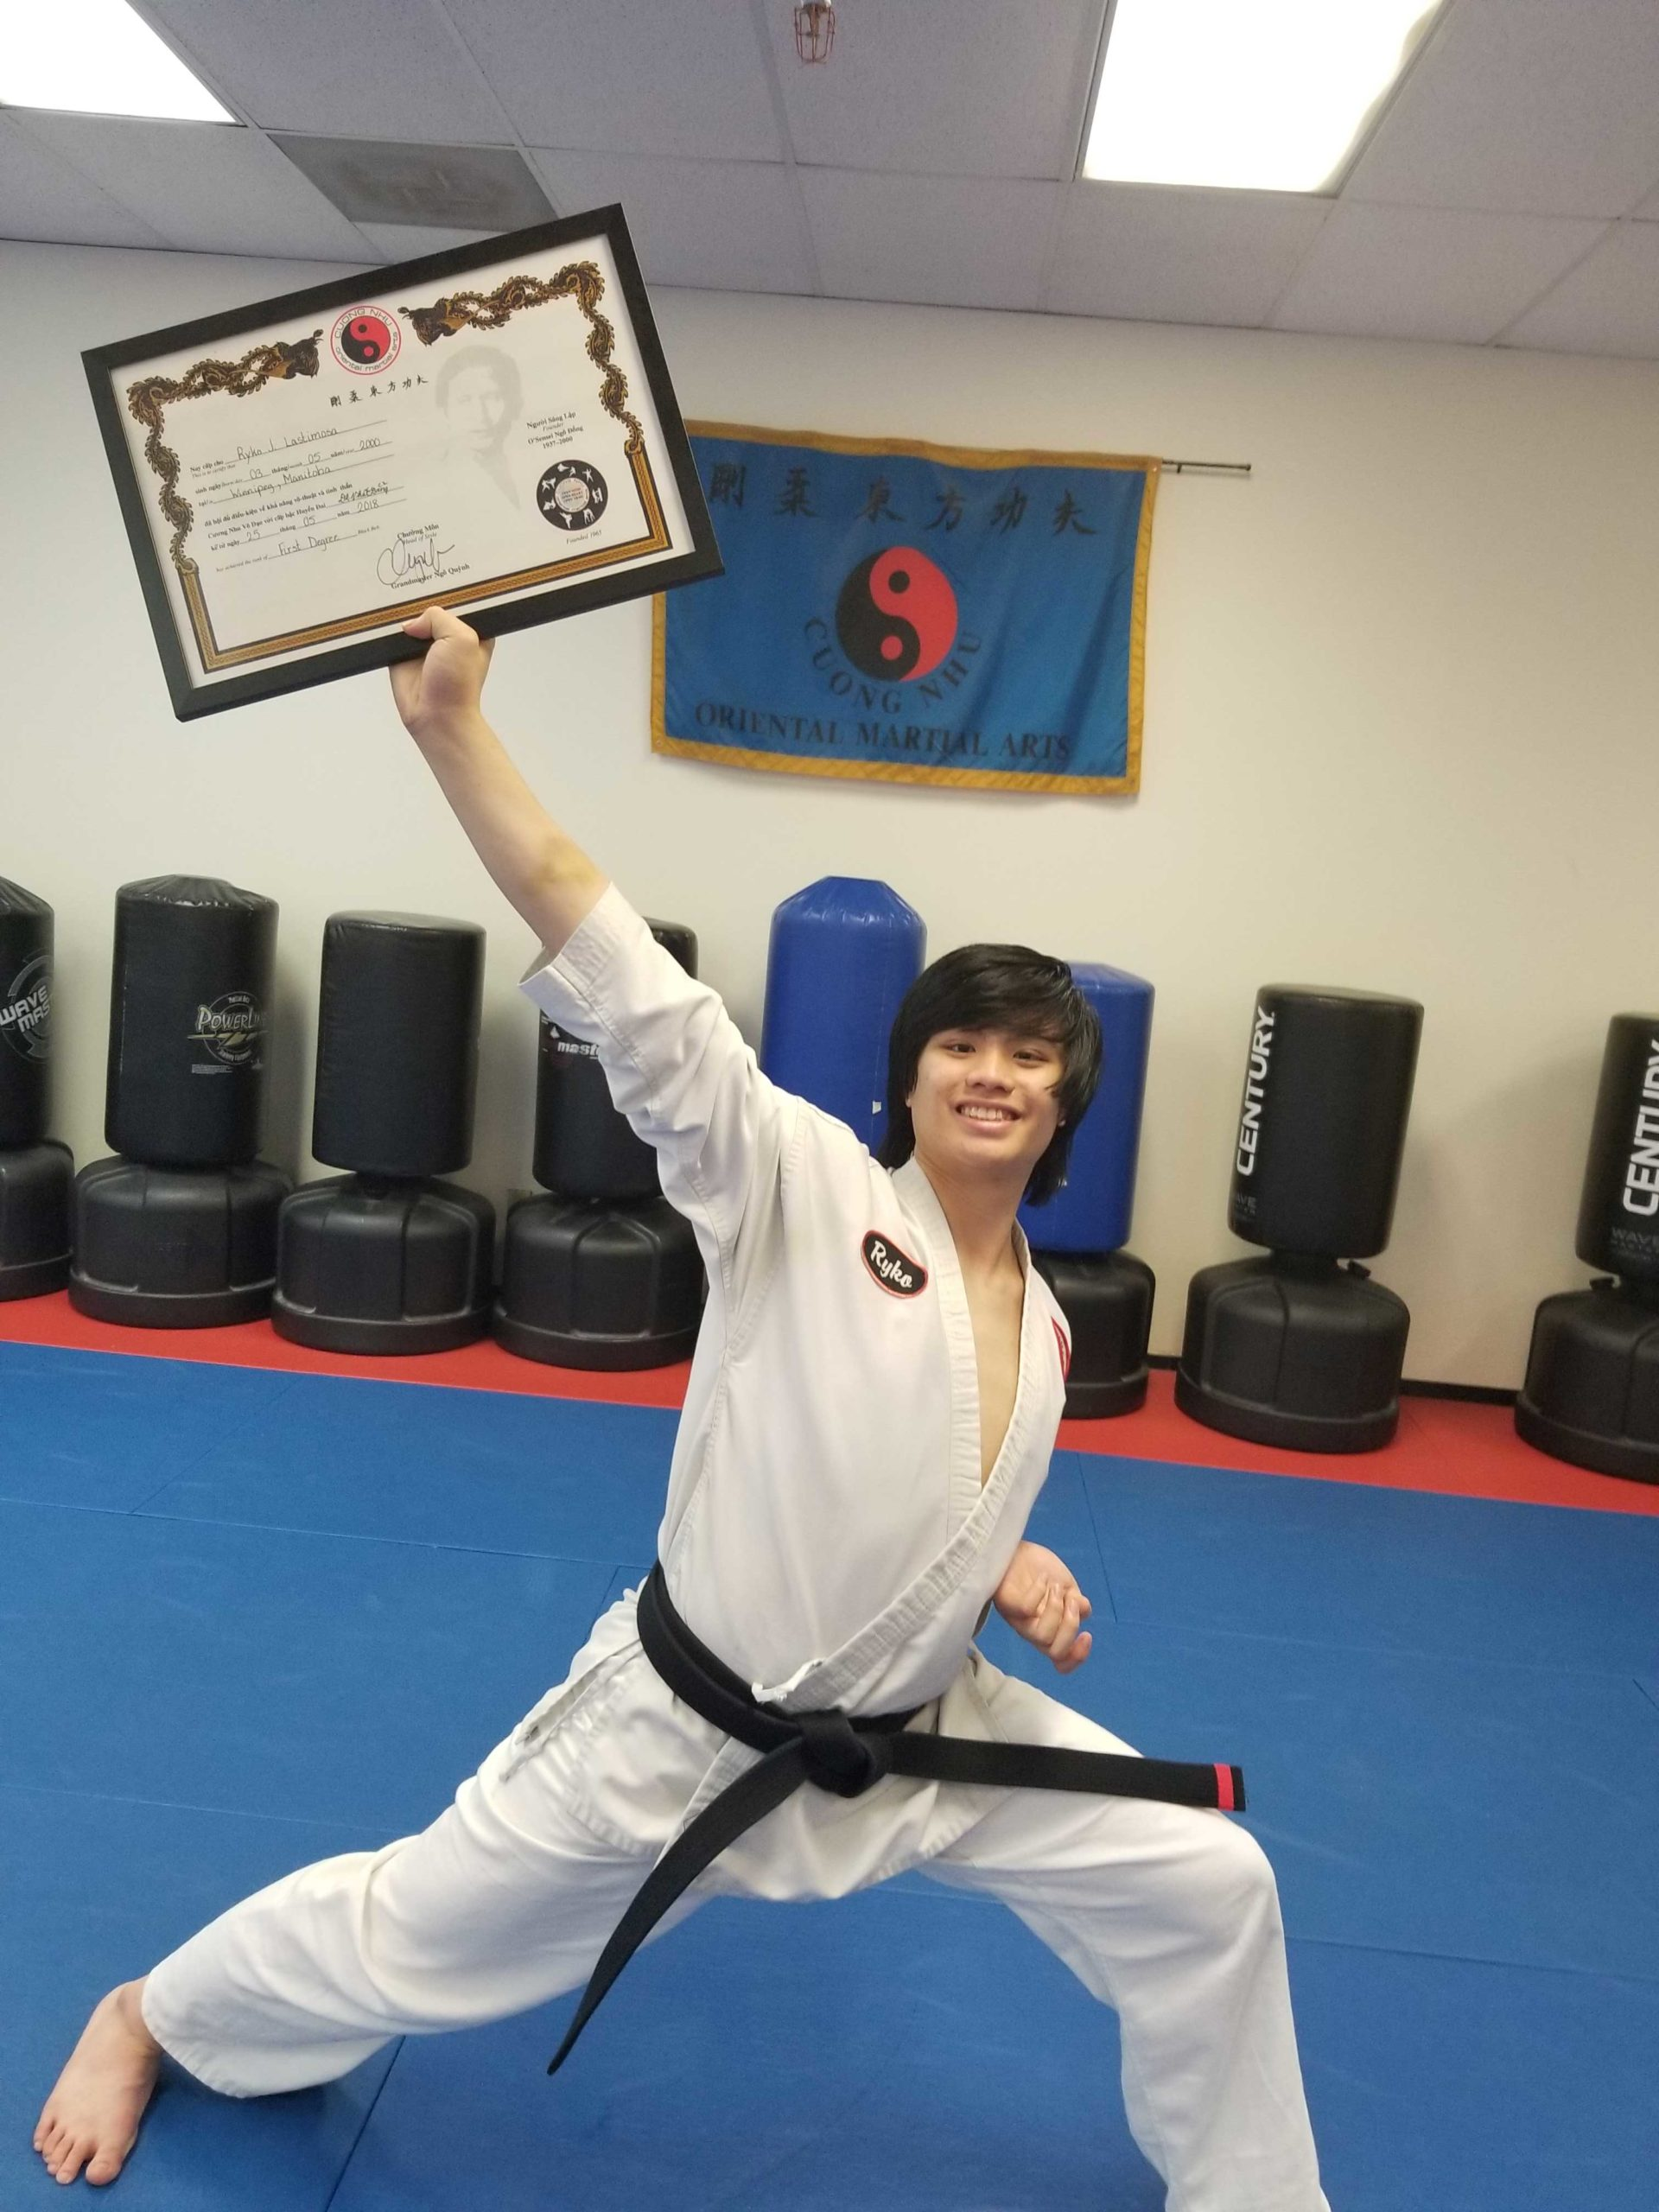 Ryko+Diploma